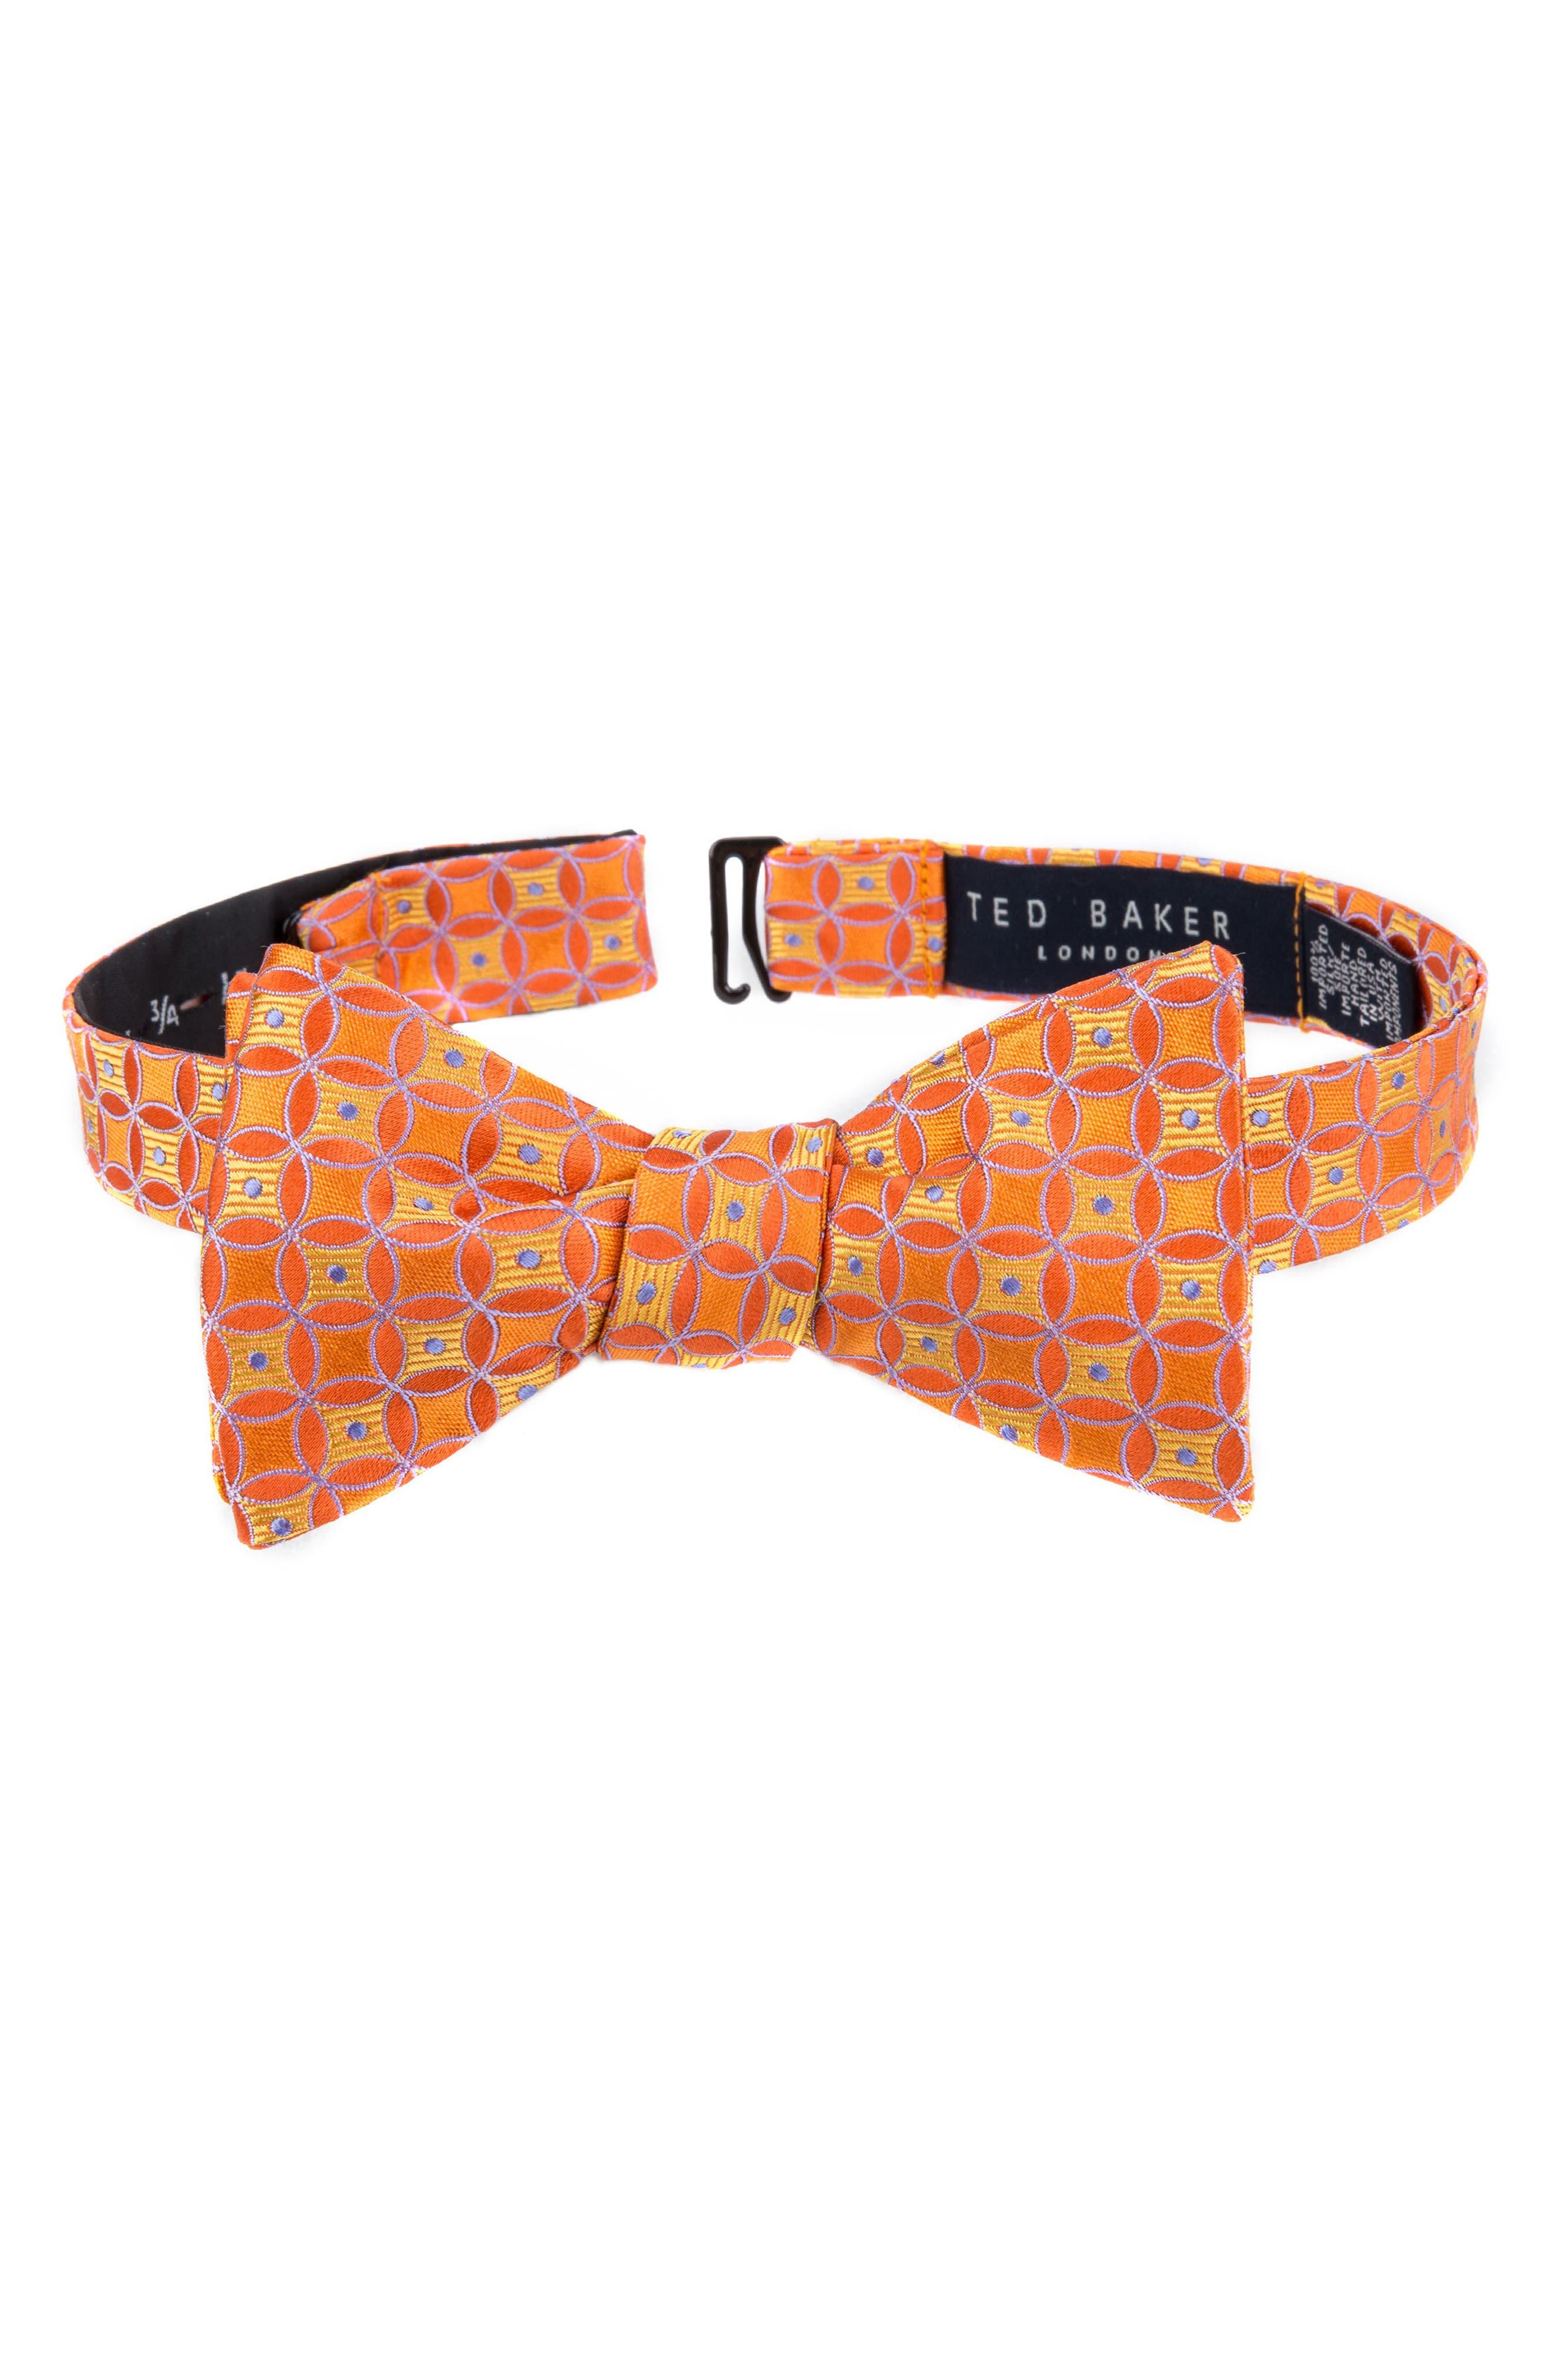 Ted Baker London Park Lane Geometric Silk Bow Tie